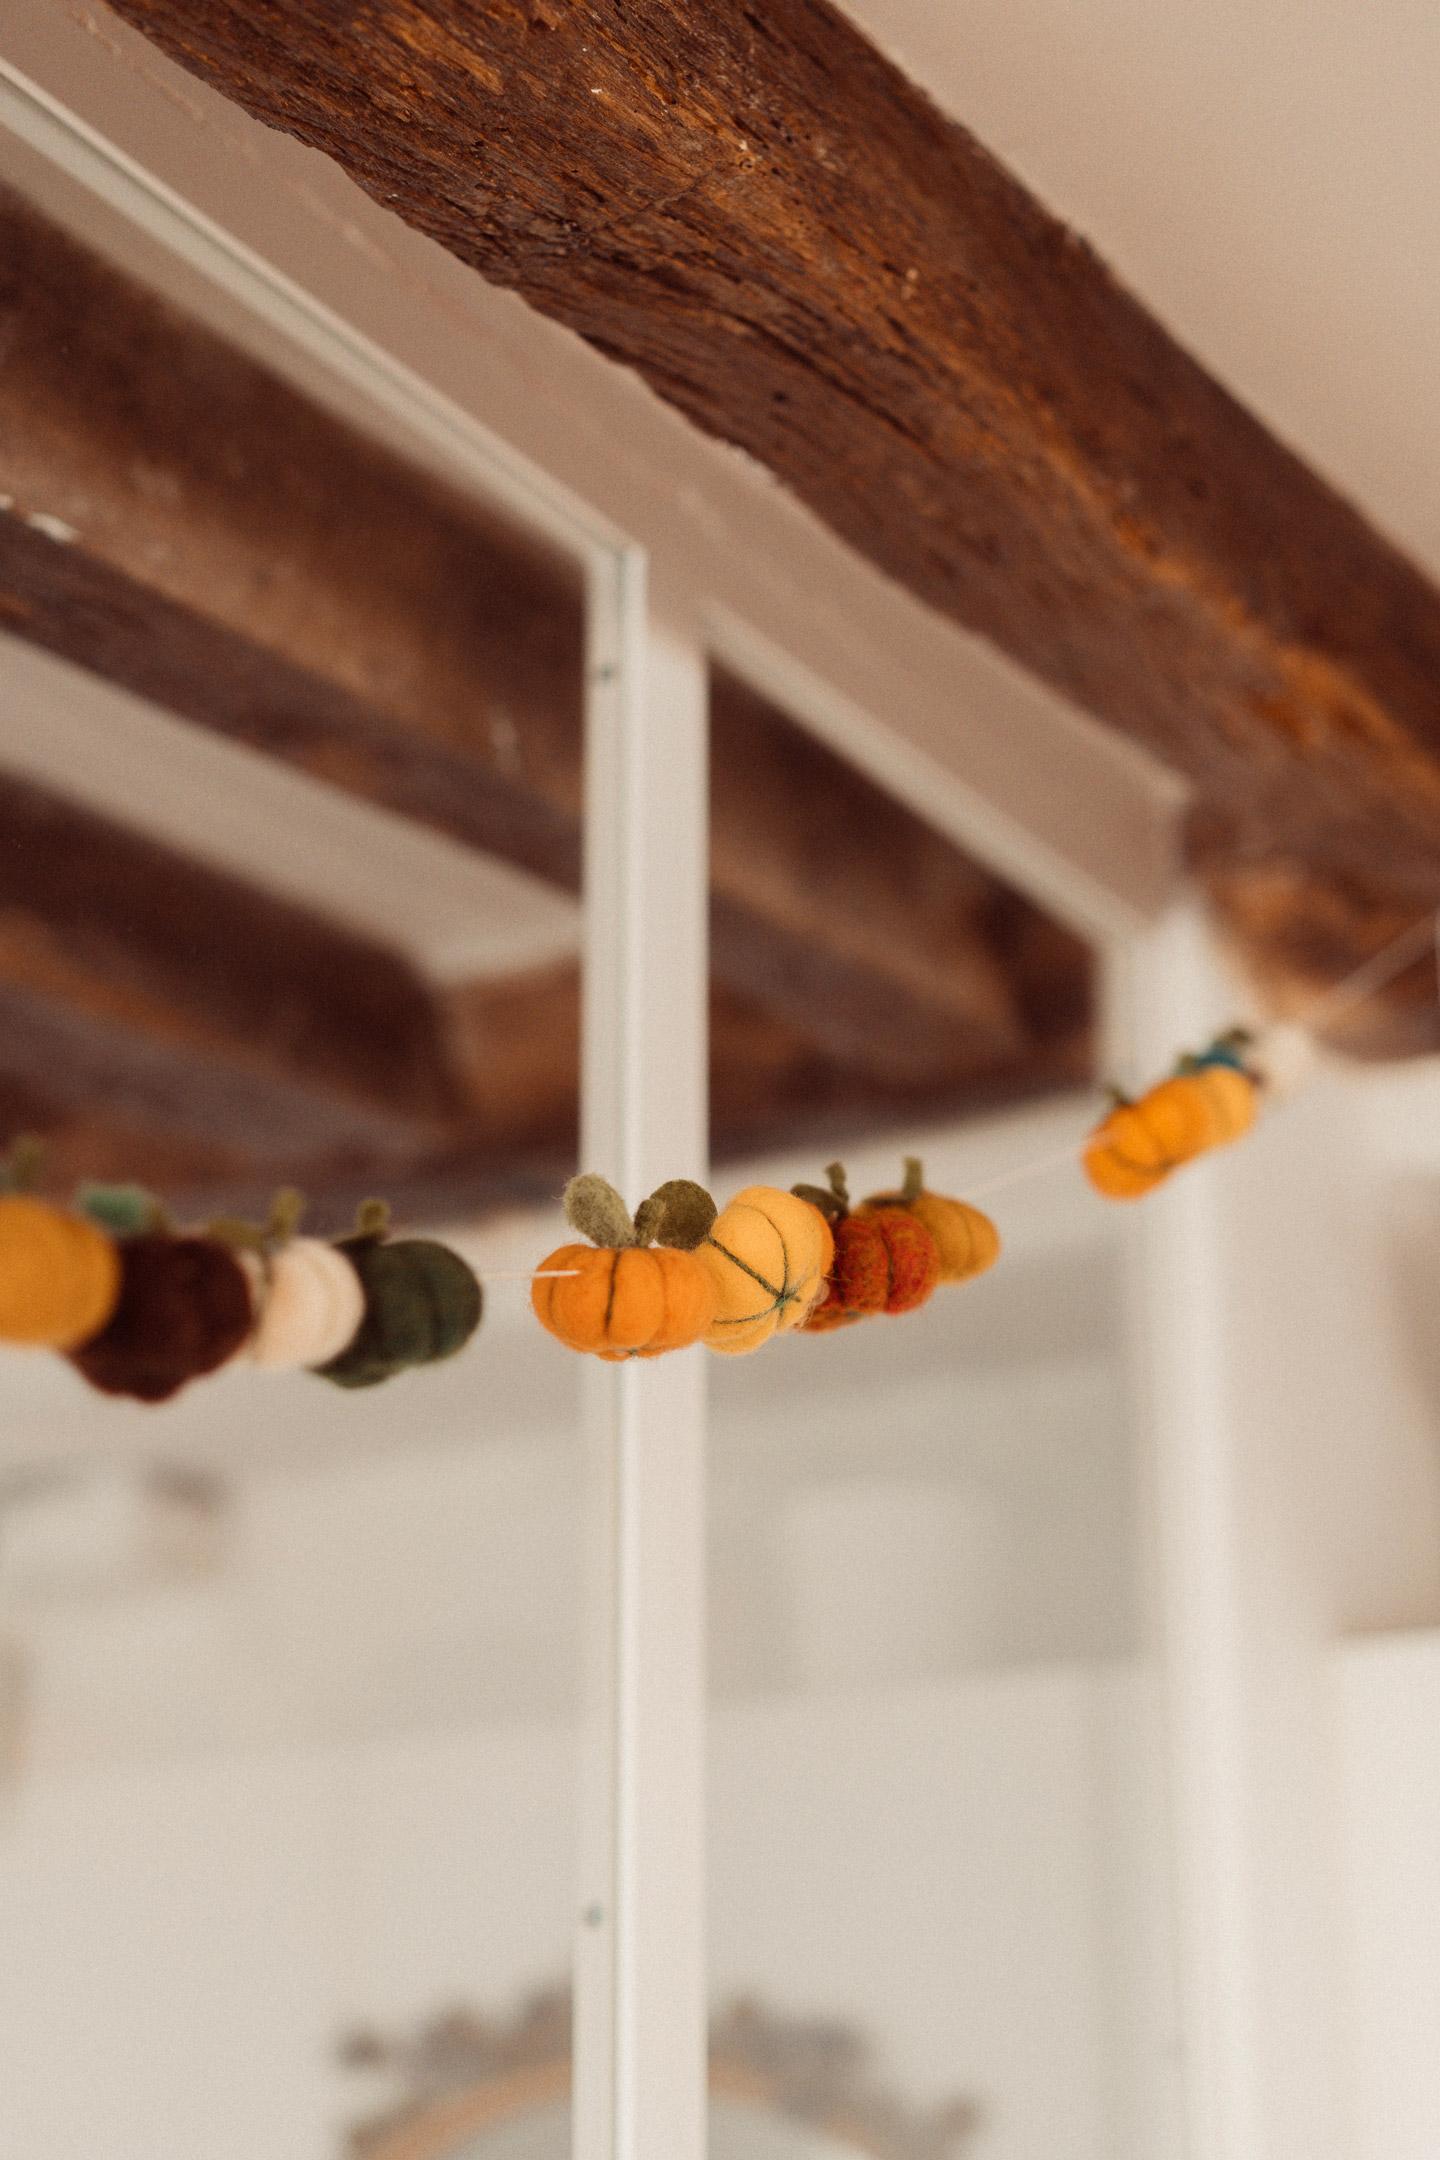 decoration-automne-01566